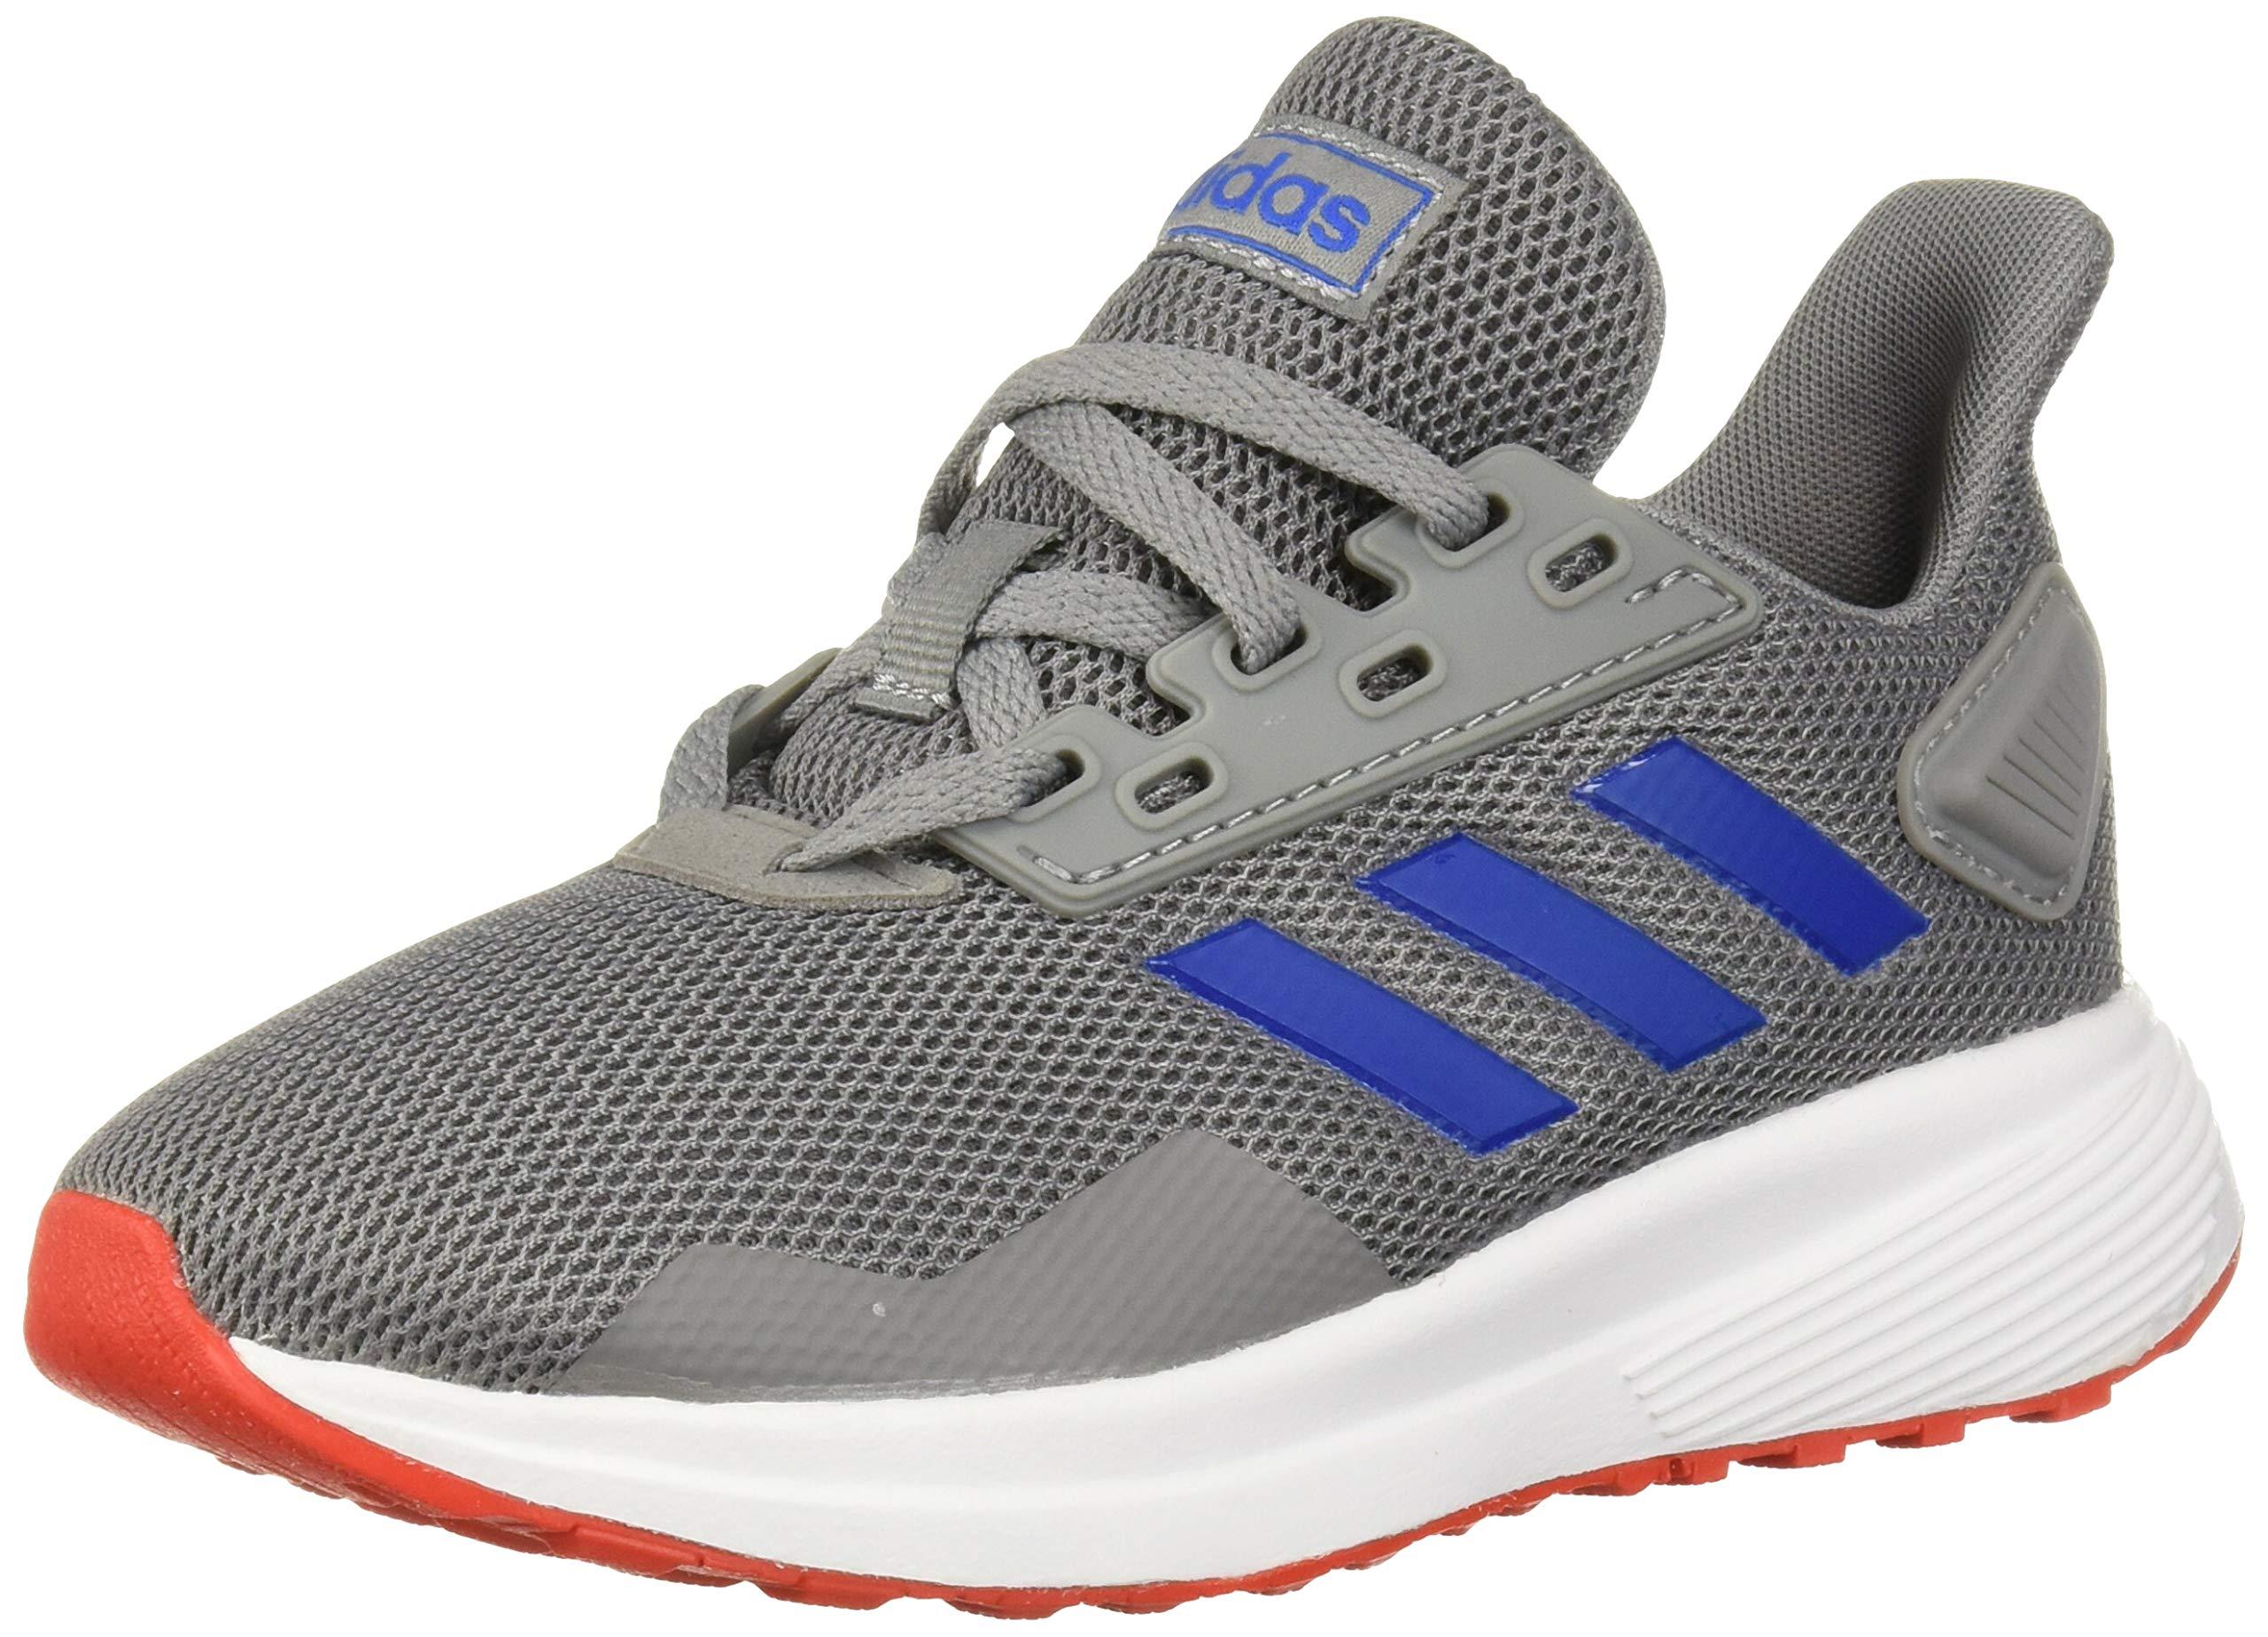 adidas Unisex Duramo 9 Running Shoe, Grey/Blue/Active Red, 11.5K M US Little Kid by adidas